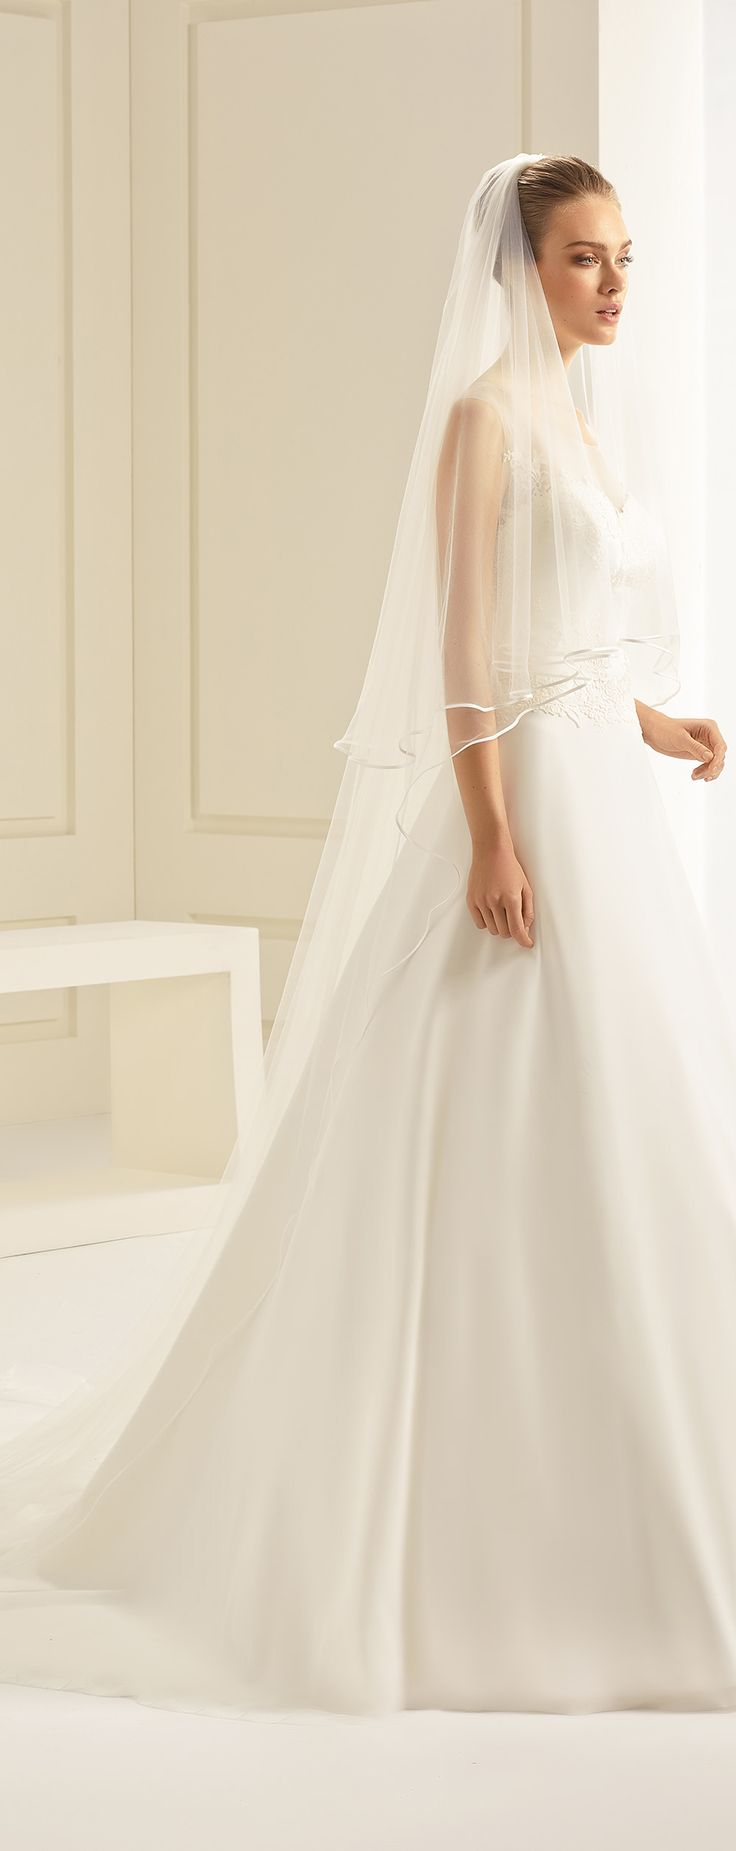 Veil S241 from Bianco Evento #collection2018 #newcollection #biancoevento2018 #biancoevento #veil #bridalaccessories #weddingdress #bridalwear #weddingideas #bridetobe